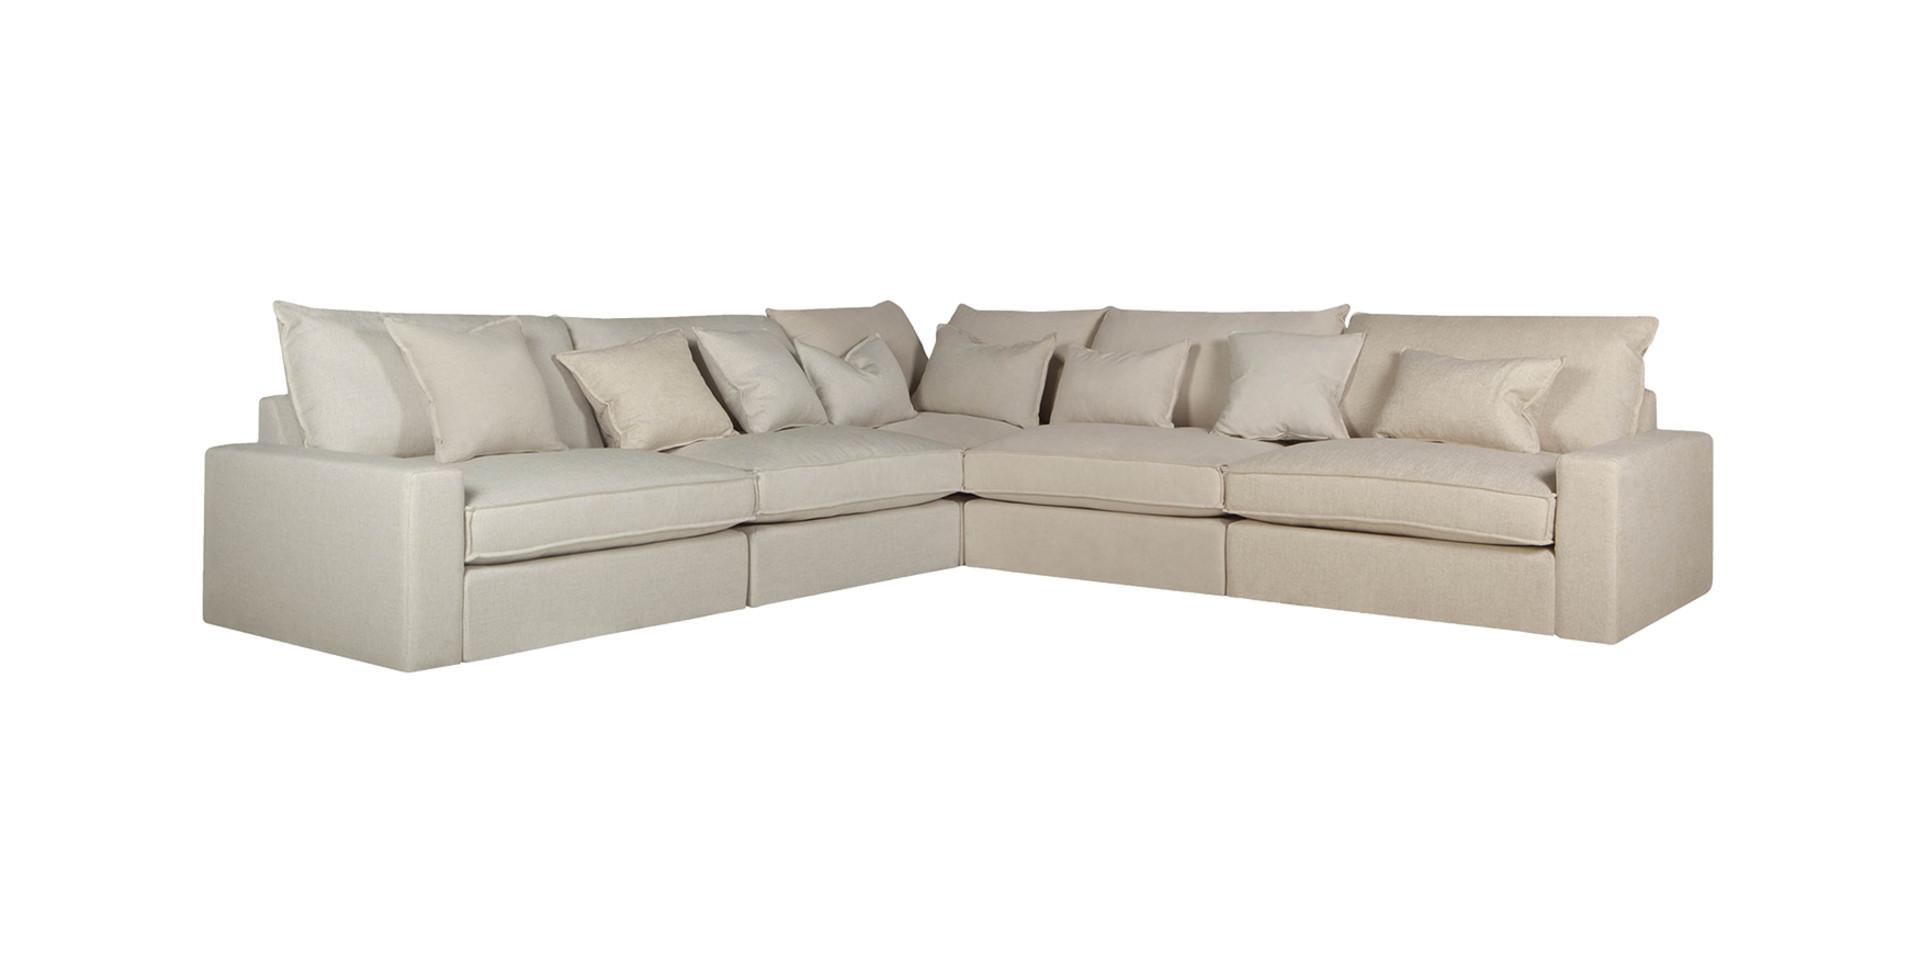 sits-oscar-angle-armchairx4_corner90_acker1_natur_nancy1_natur_caleido1419_natur_5